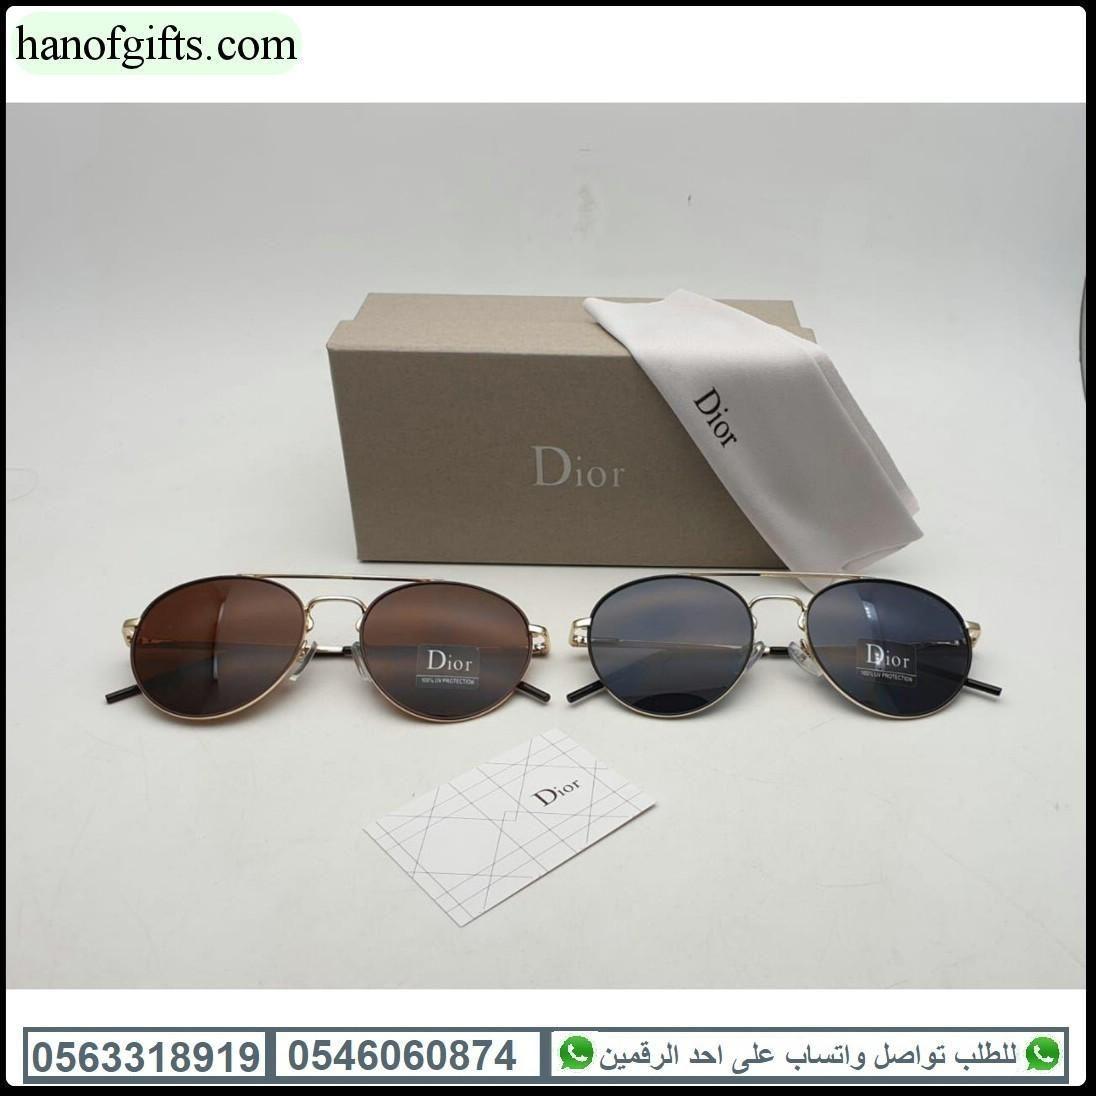 ديور نظارات شمسية موديل رجالي Dior احصل عليها اليوم مع ملحقات الماركه هدايا هنوف In 2020 Sunglasses Glasses Oval Sunglass